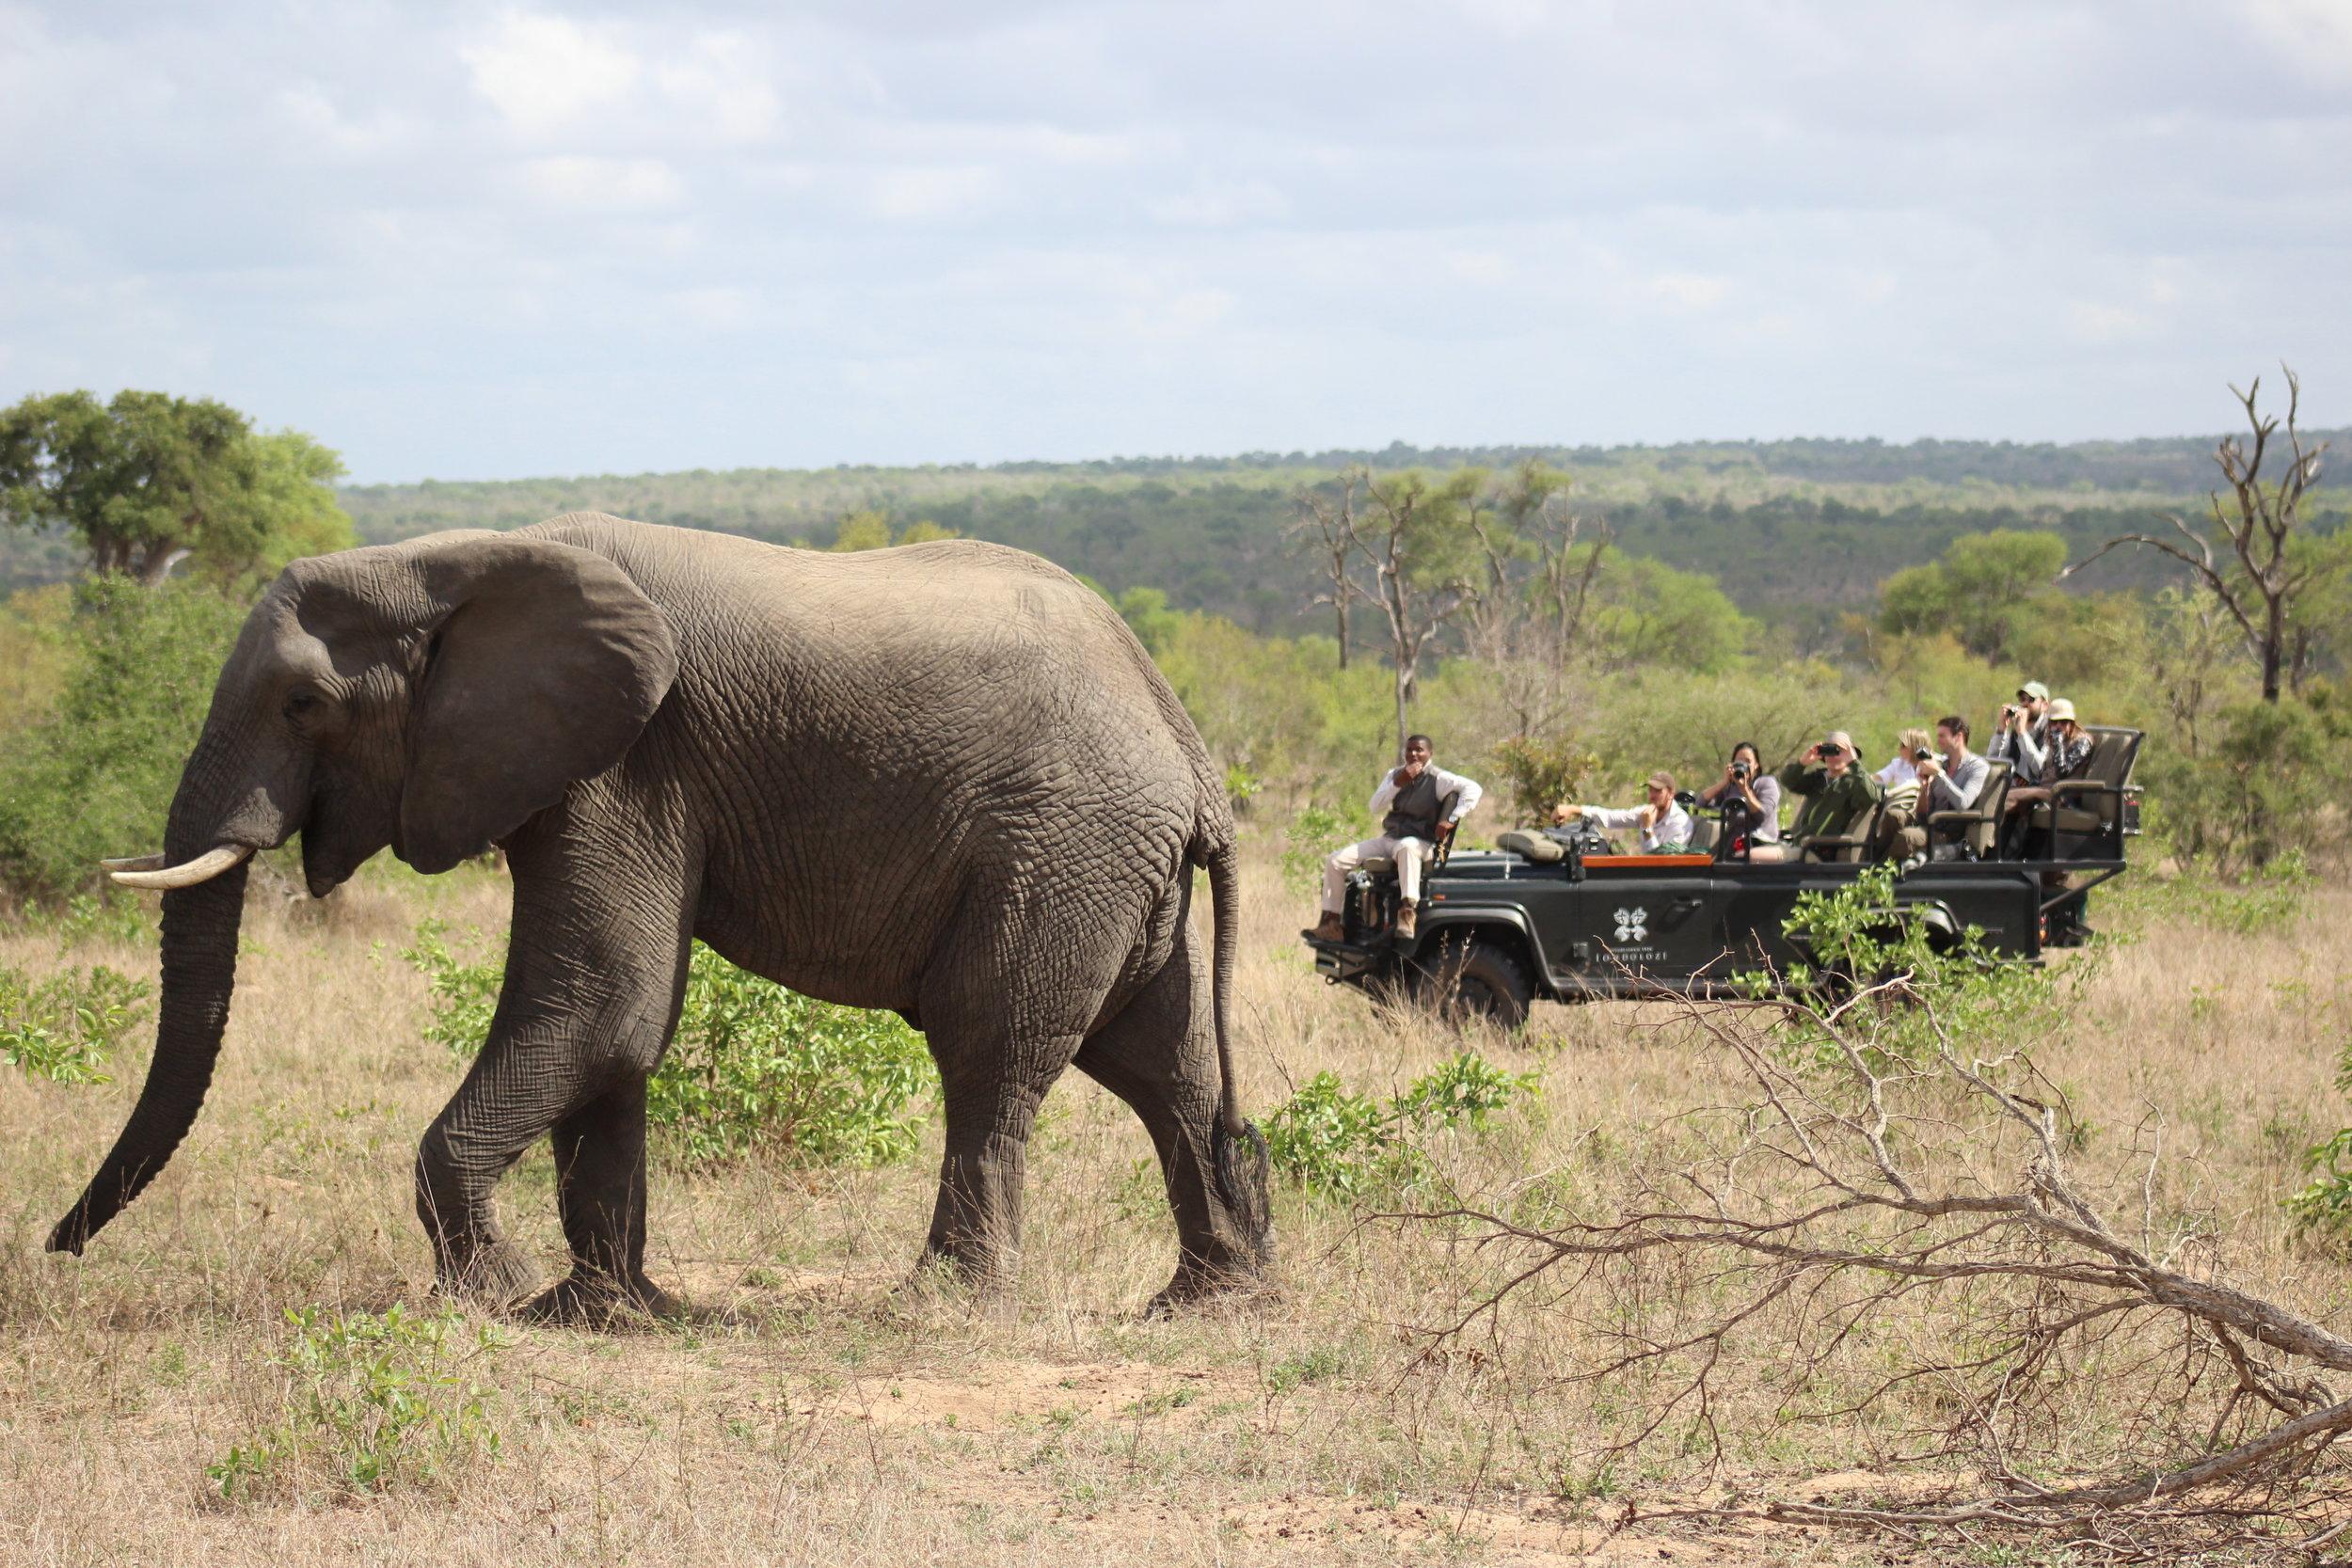 elephant safari south africa.jpg